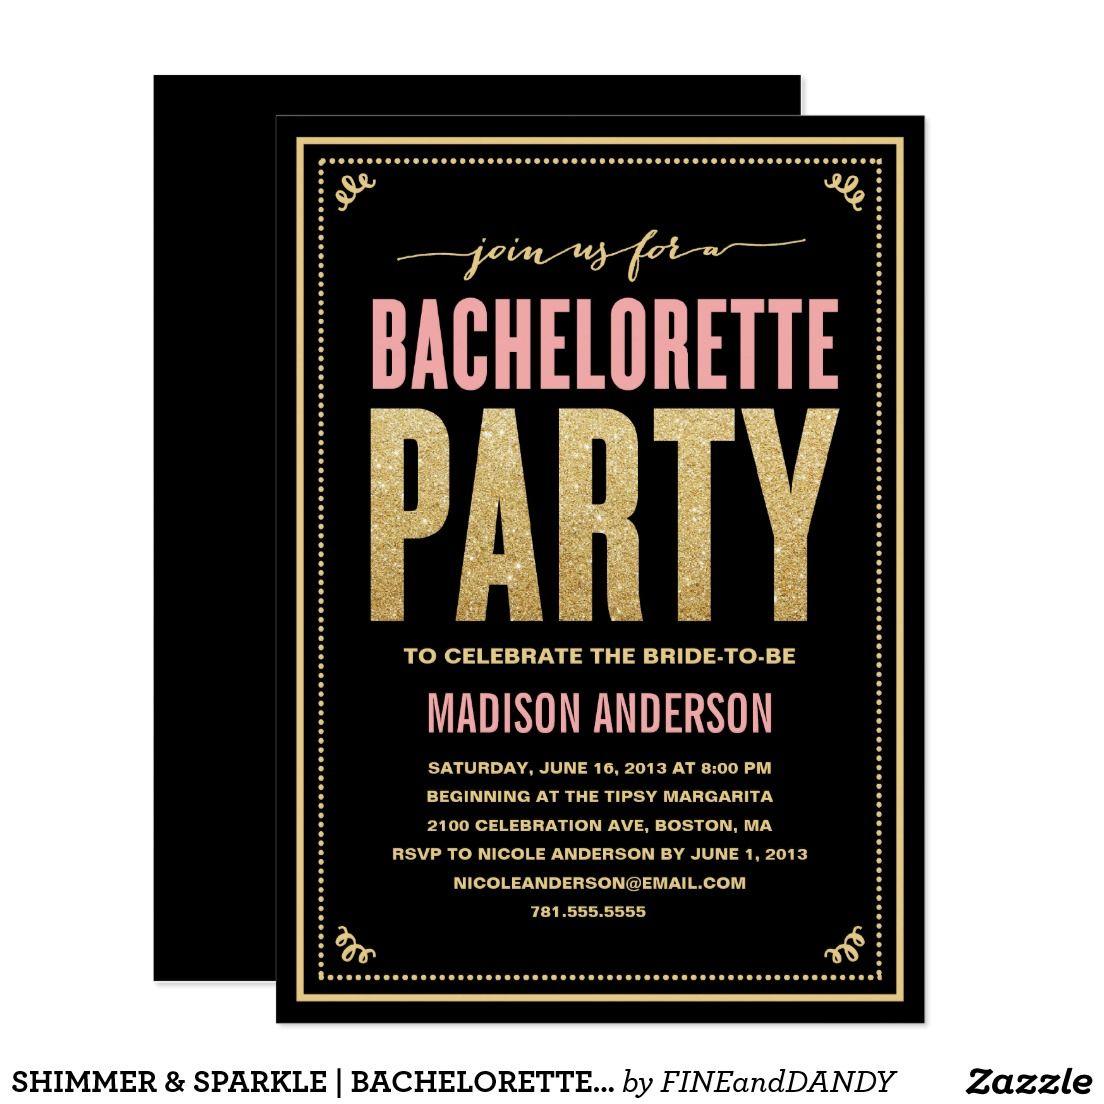 SHIMMER & SPARKLE   BACHELORETTE PARTY INVITATION